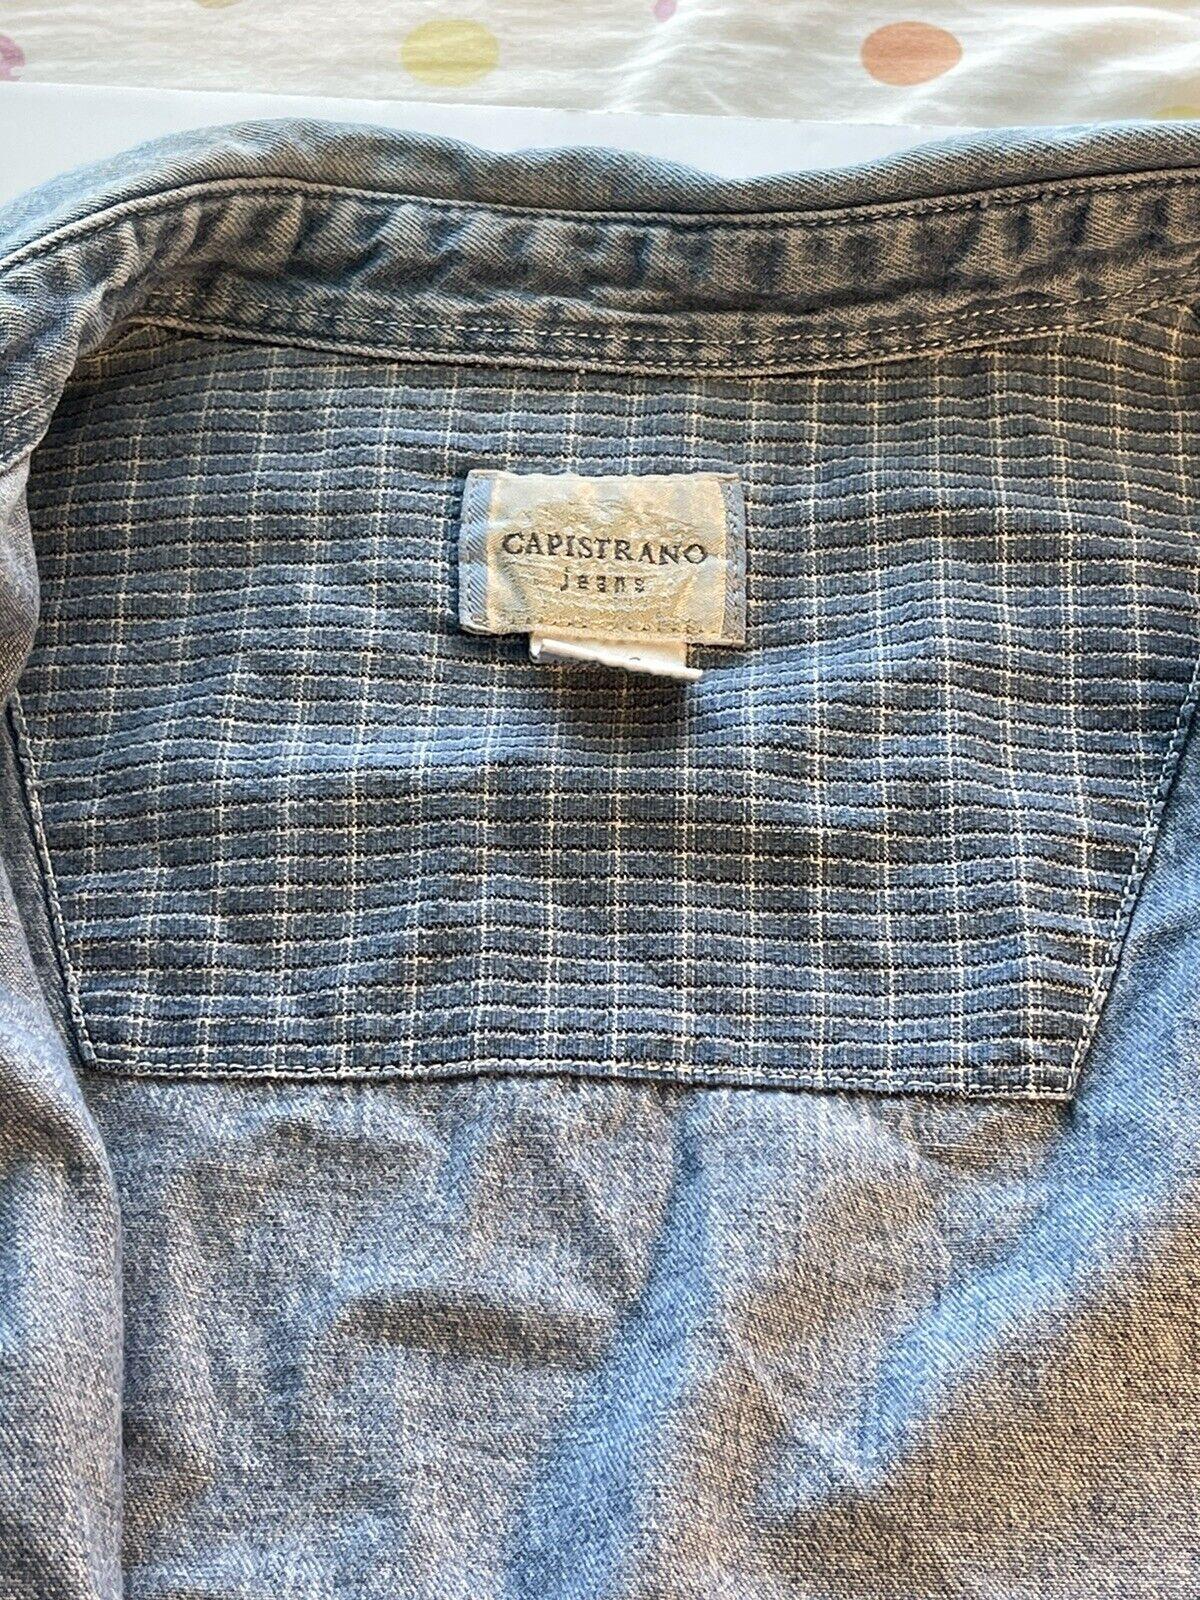 capristrano jeans jacket shirt - image 2